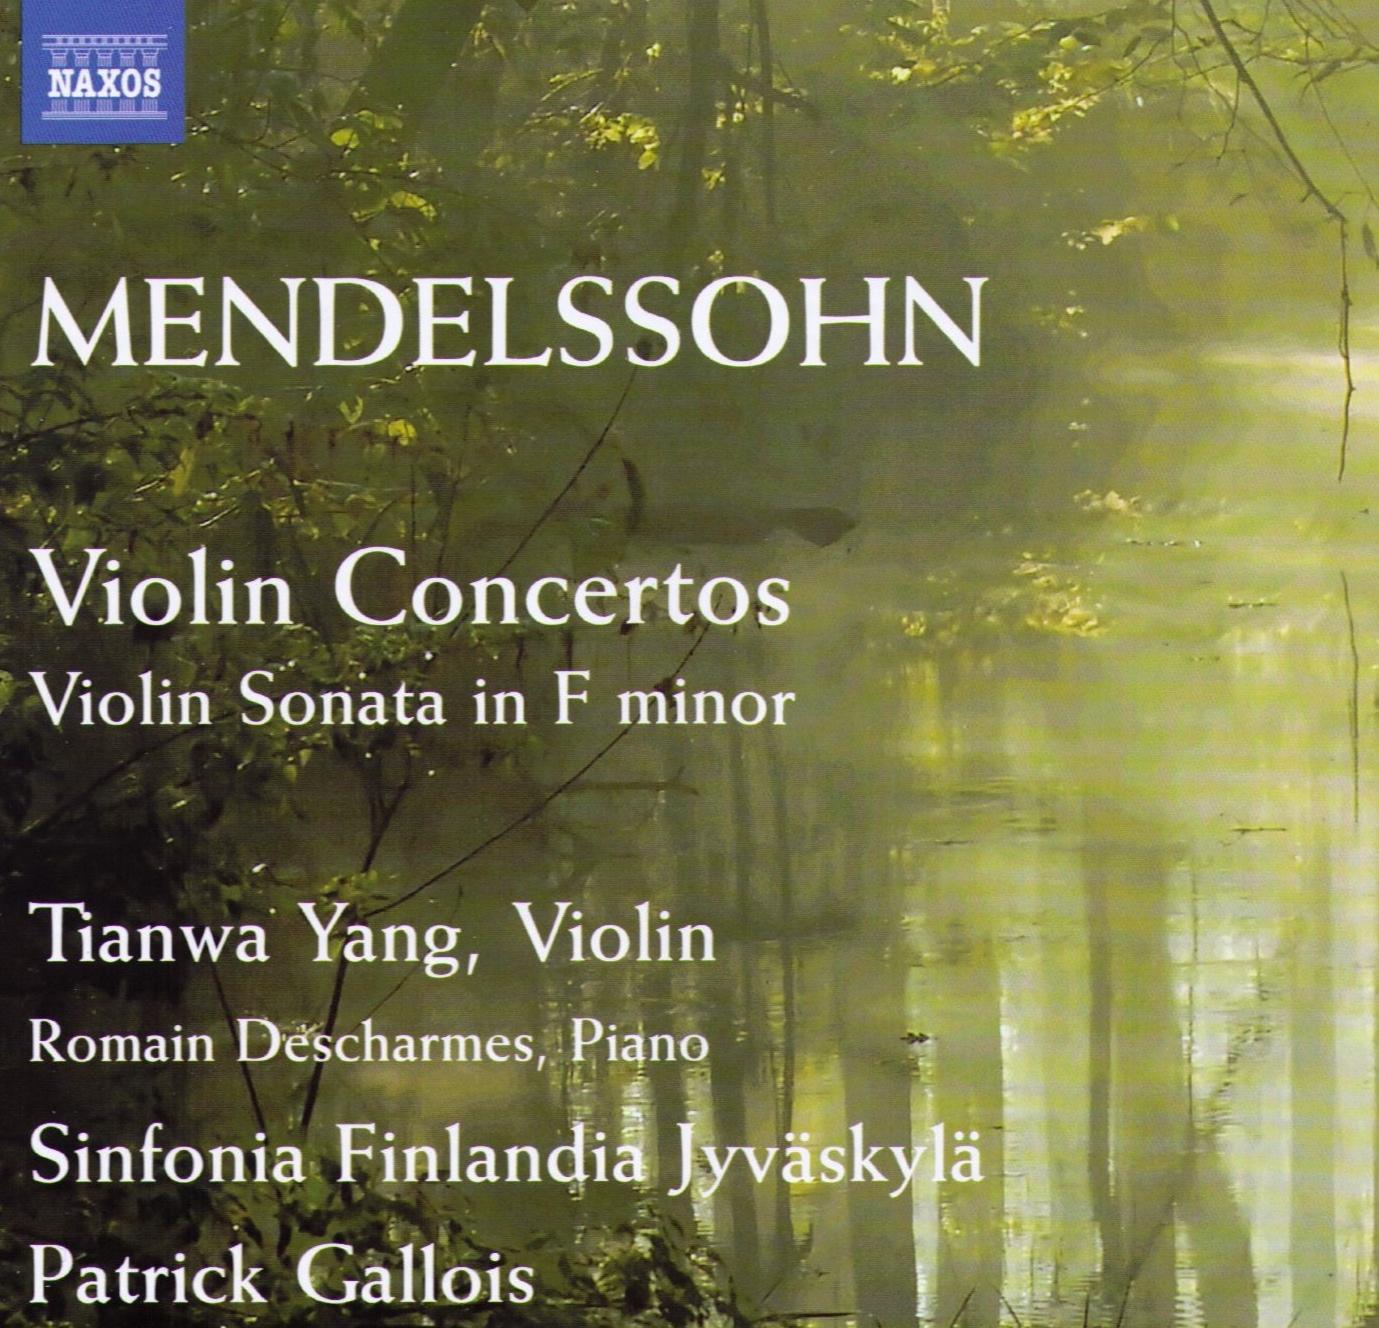 Felix Mendelssohn Bartholdy  Violin Concertos, Sonata F minor (1823)  Tianwa Yang, Violin Sinfonia Finlandia Jyväskylä Patrick Gallois Romain Descharmes, Piano Label: NAXOS 8.572662   More Info   Review